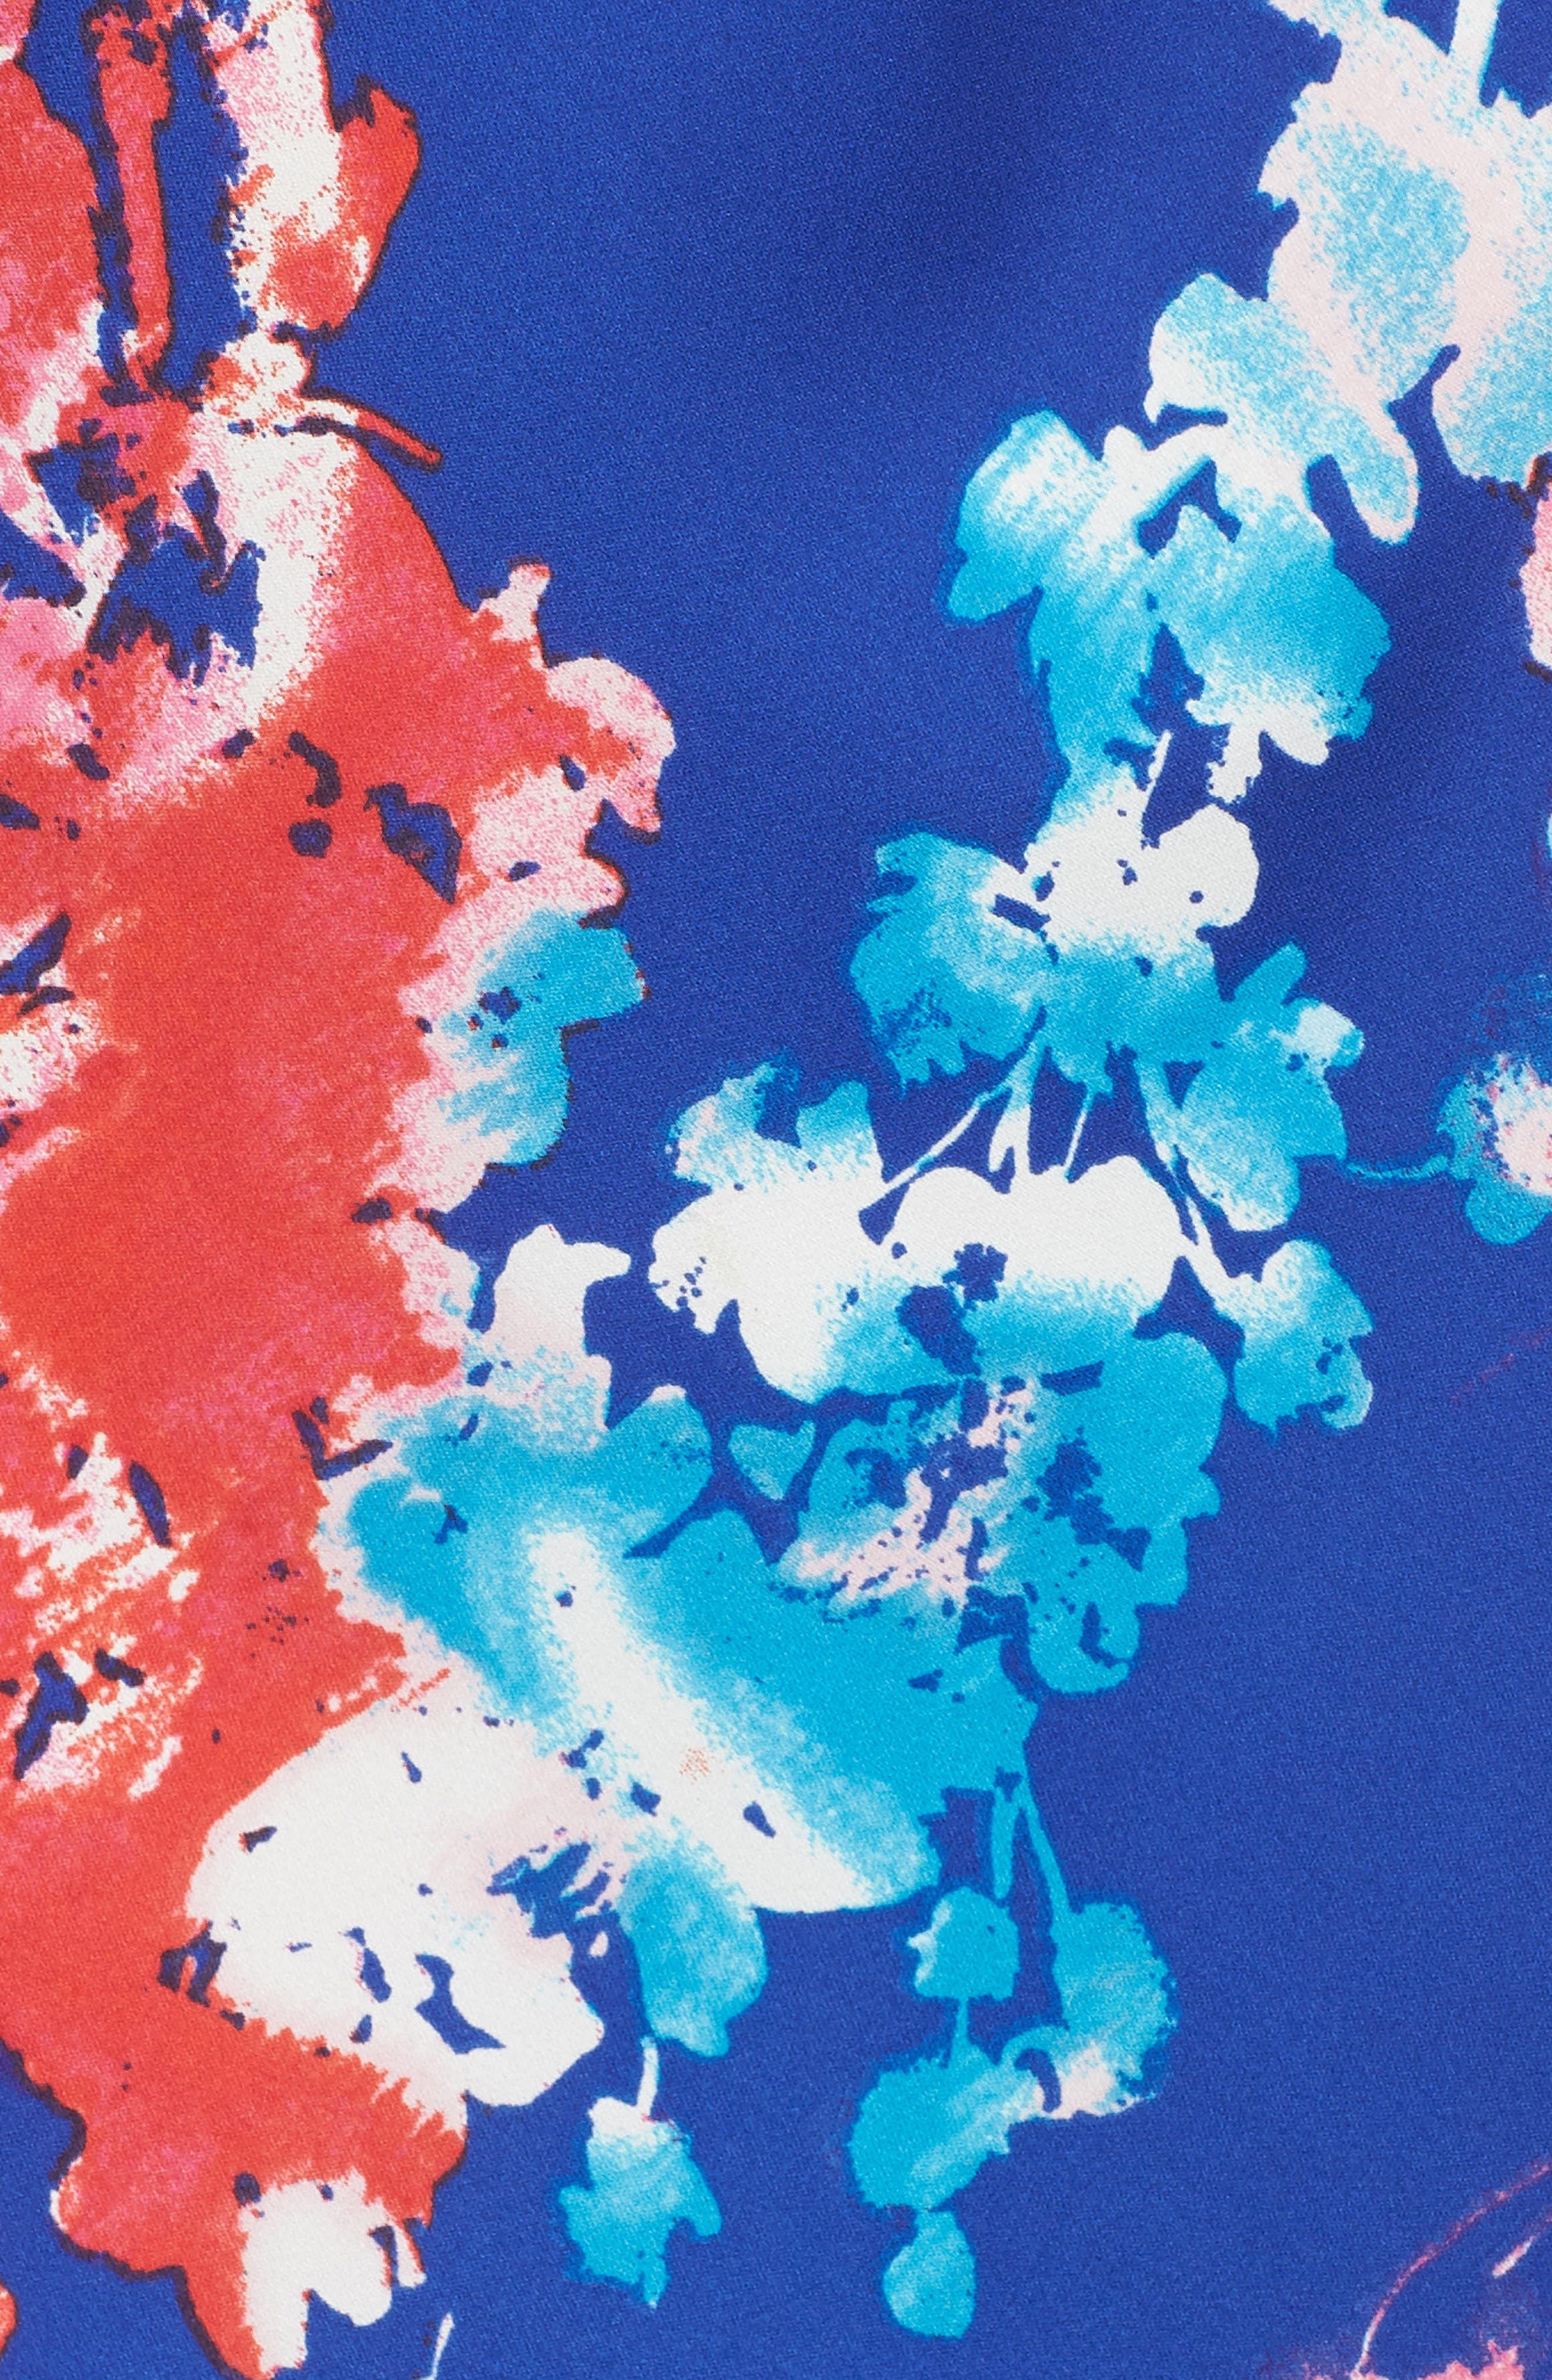 Fiji Chemise,                             Alternate thumbnail 6, color,                             Cob Cobalt